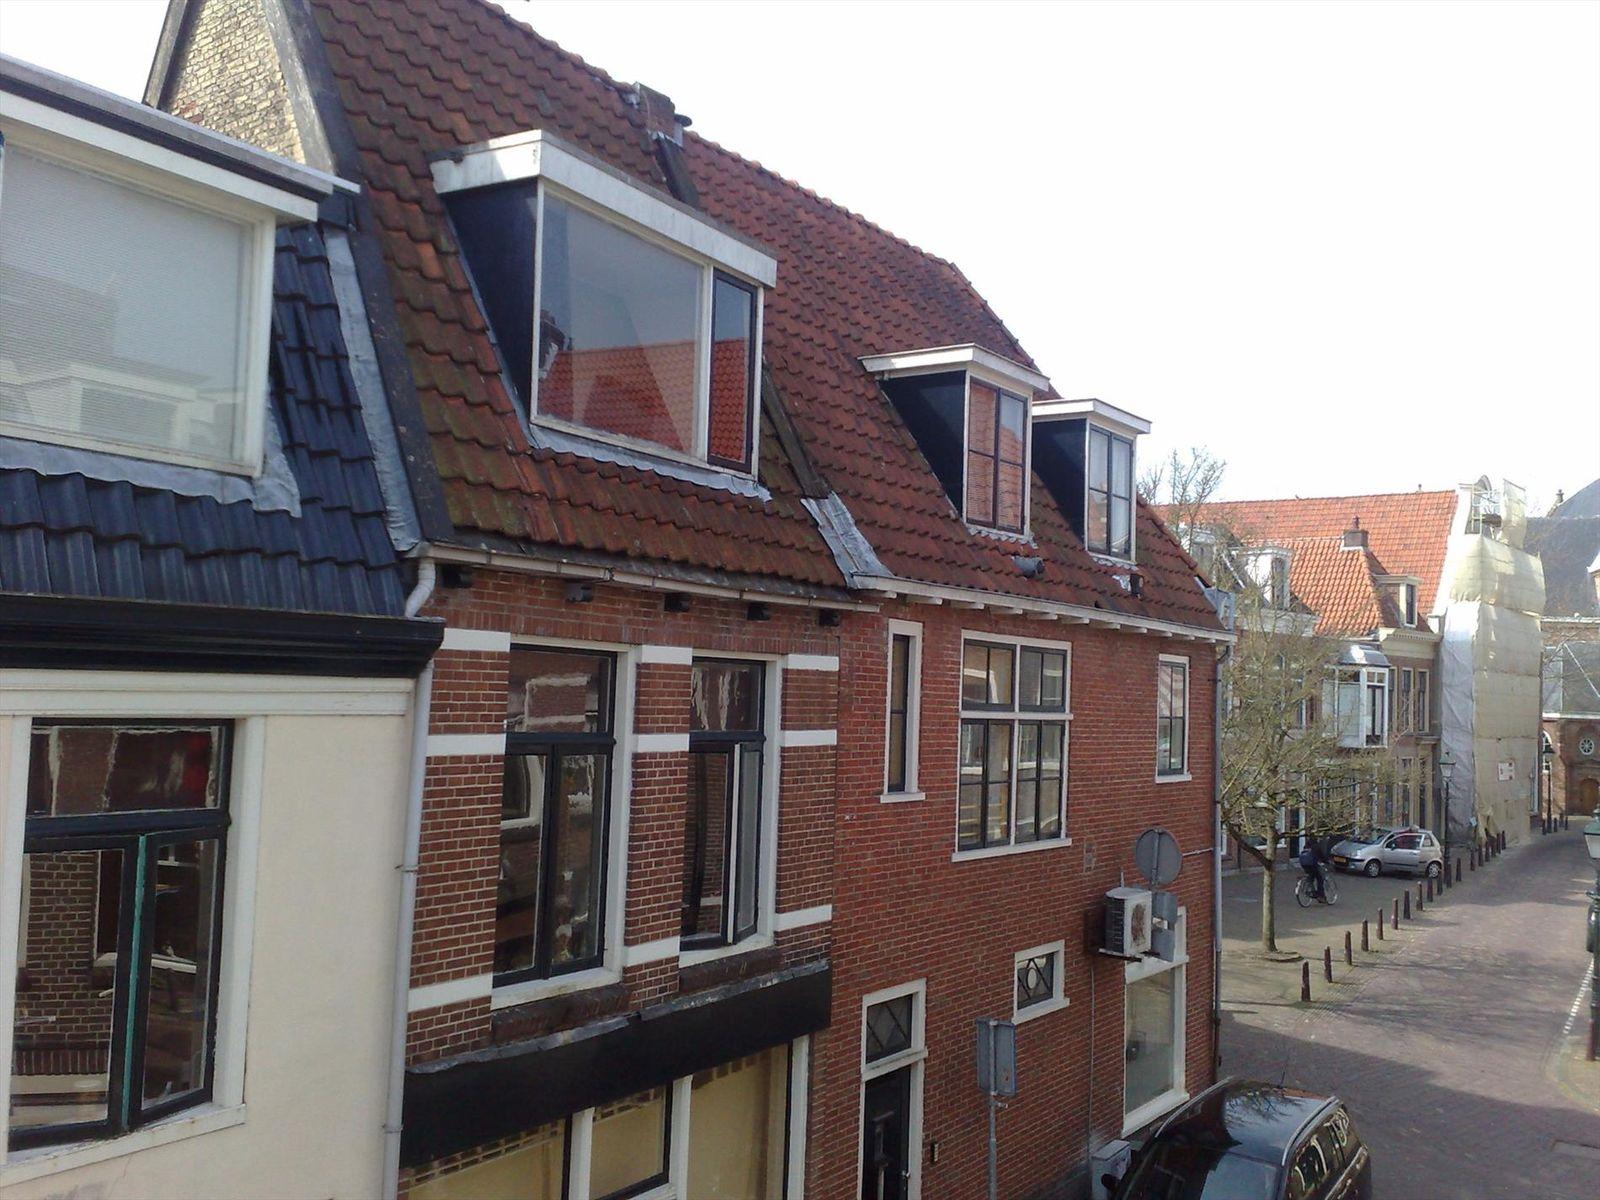 Sacramentsstraat, Leeuwarden